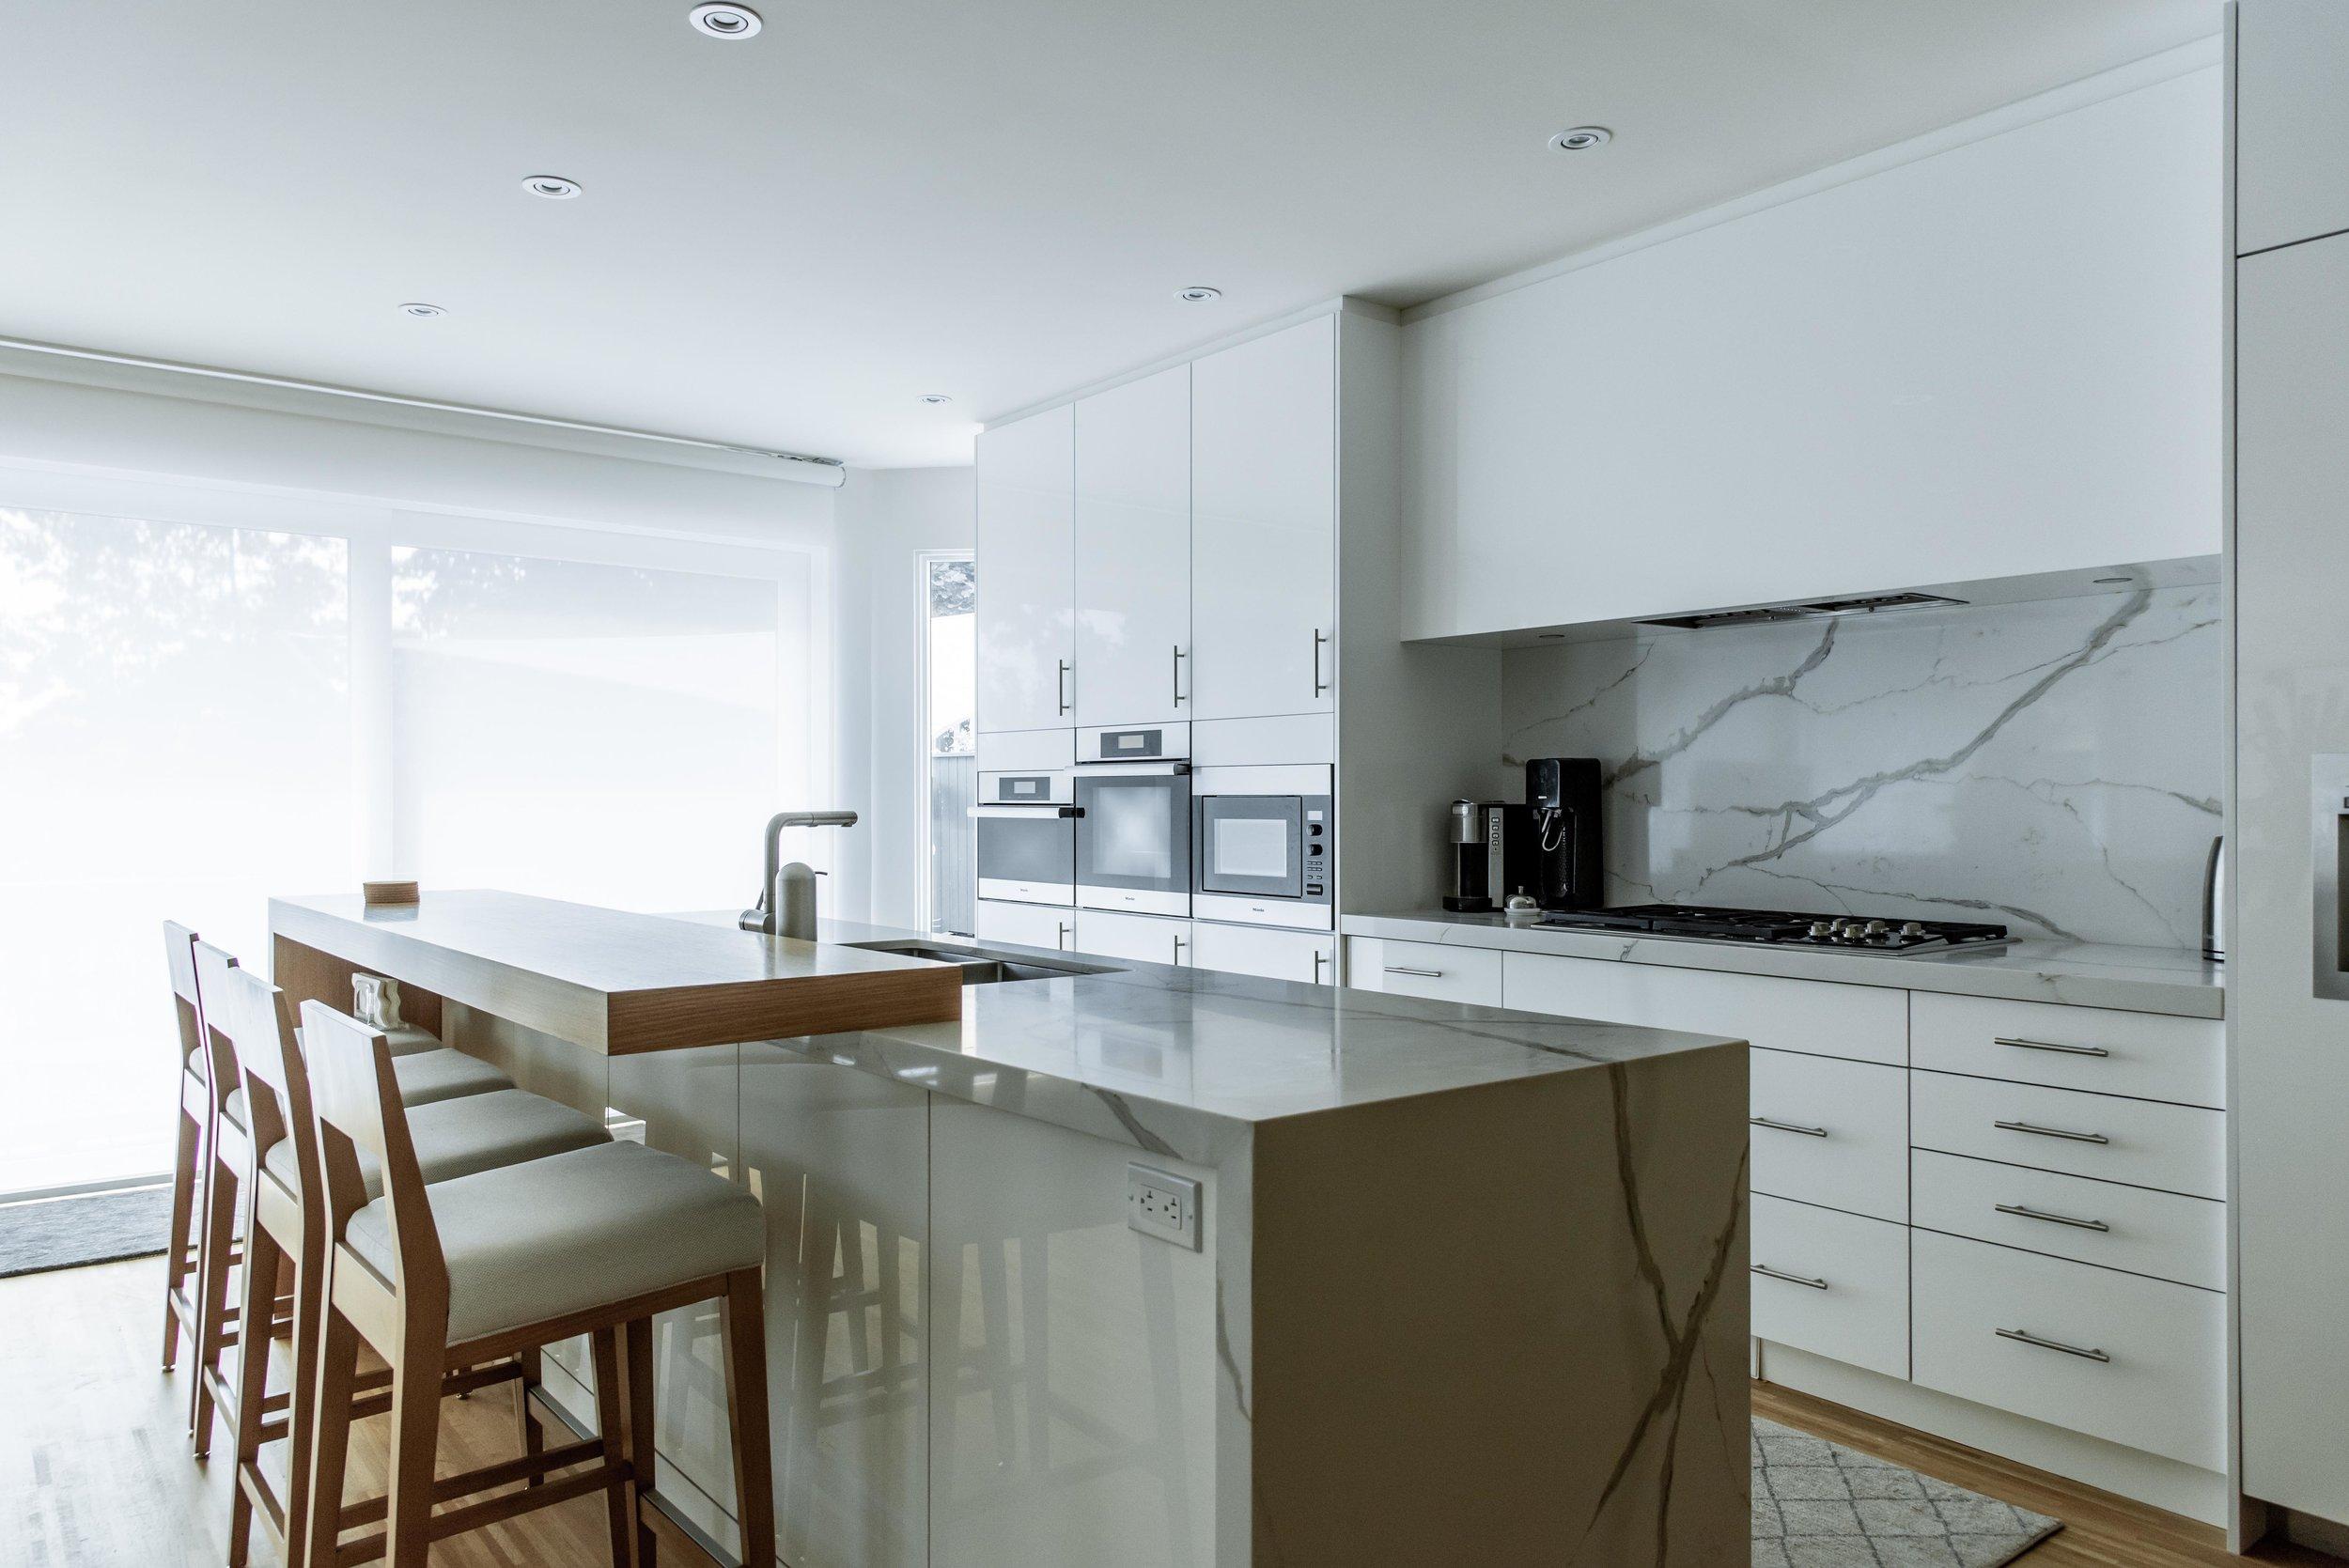 DSC_9123 - Kitchen Low.jpg